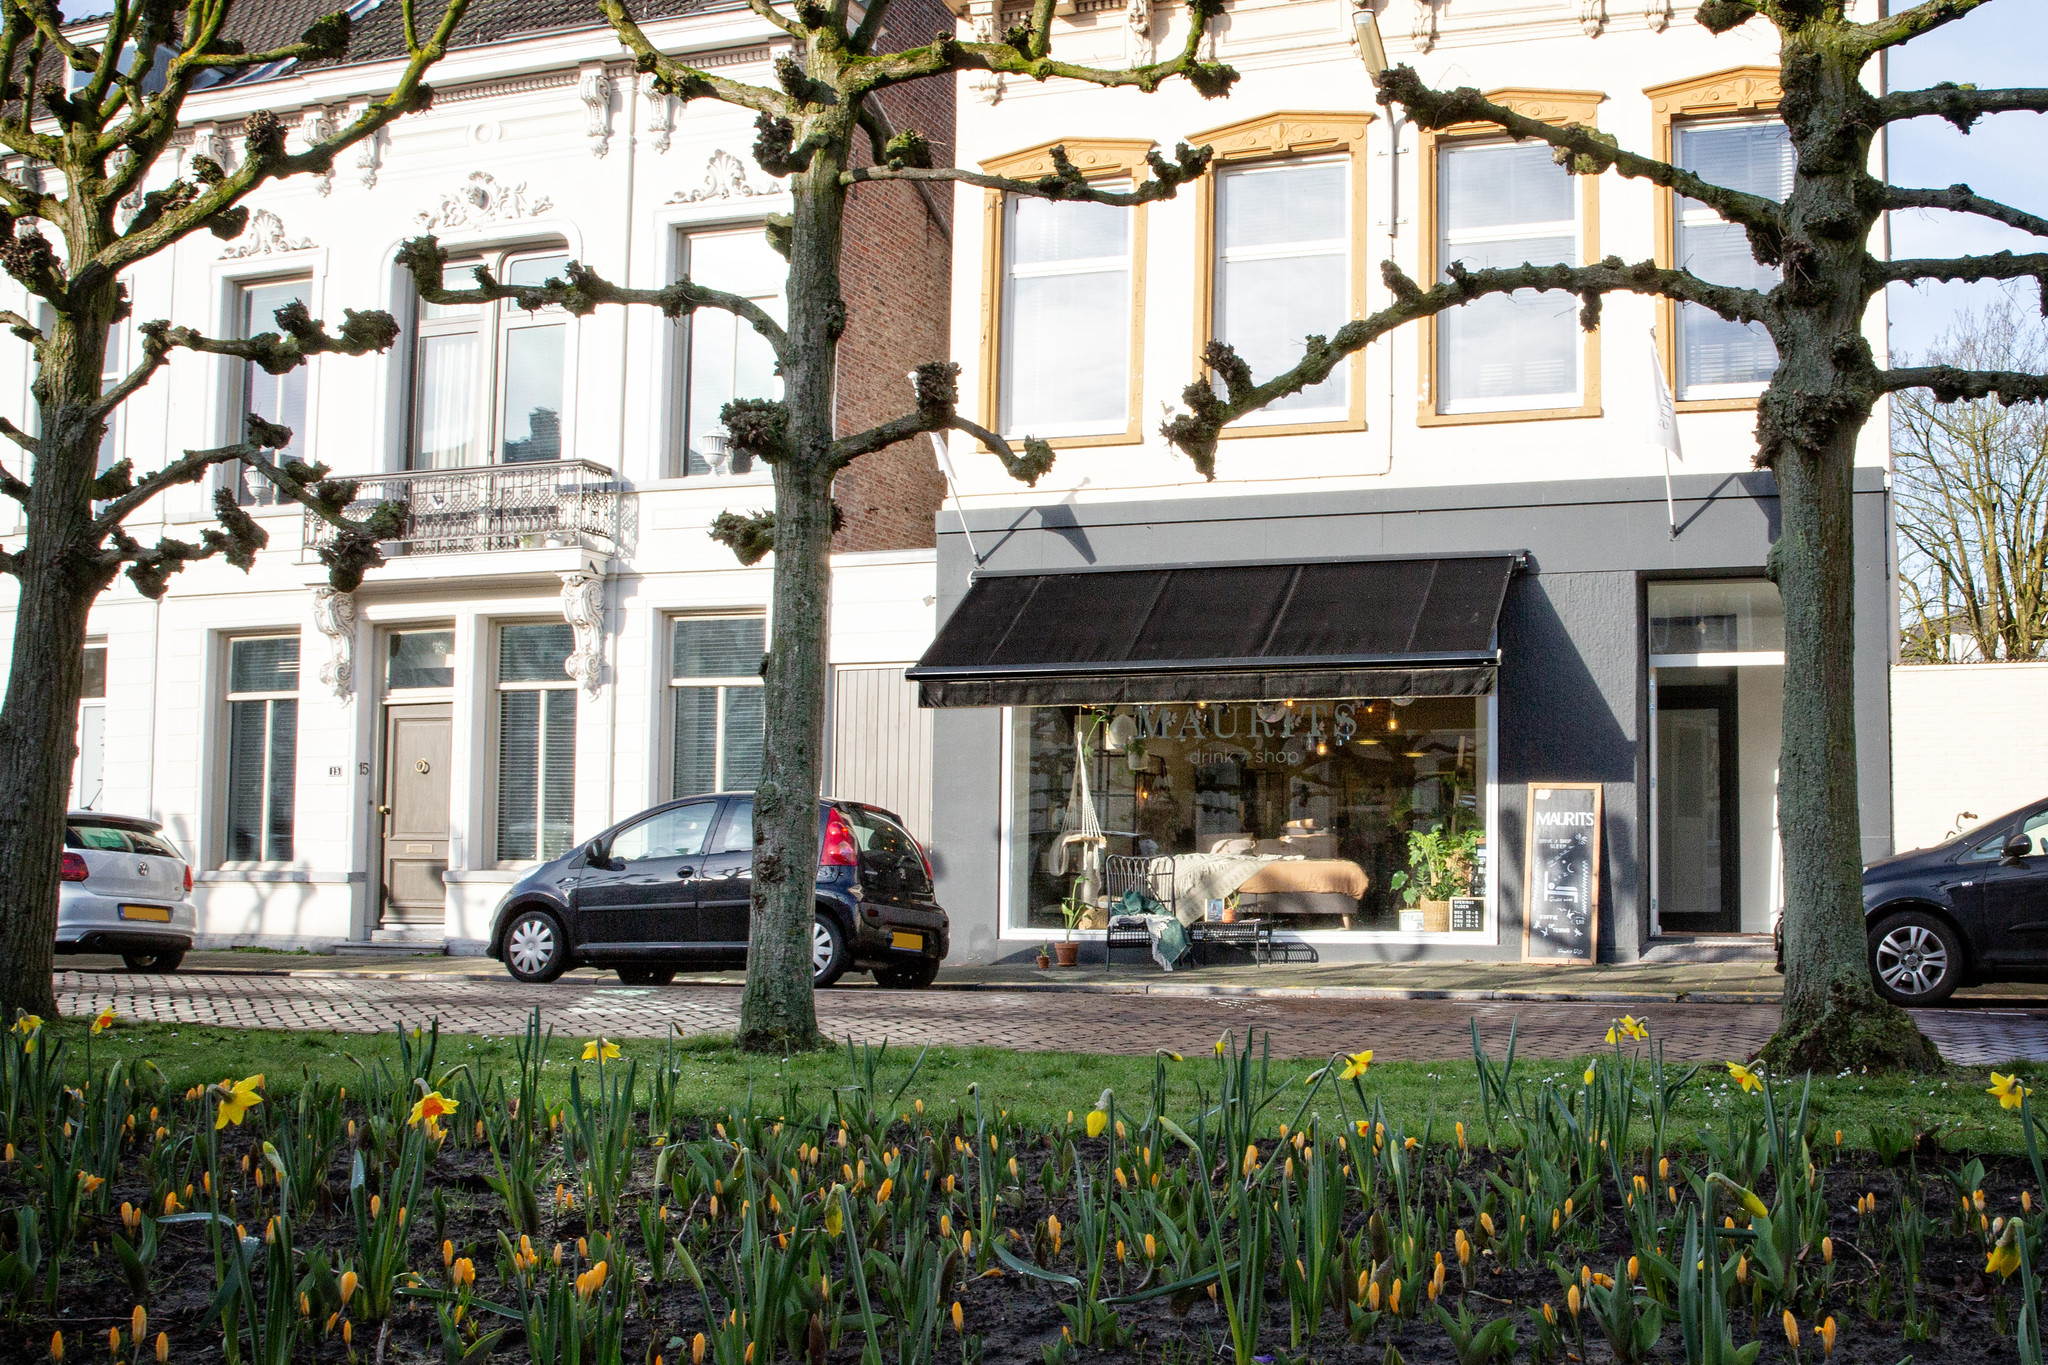 Maurits Shop Beddenwinkel Breda